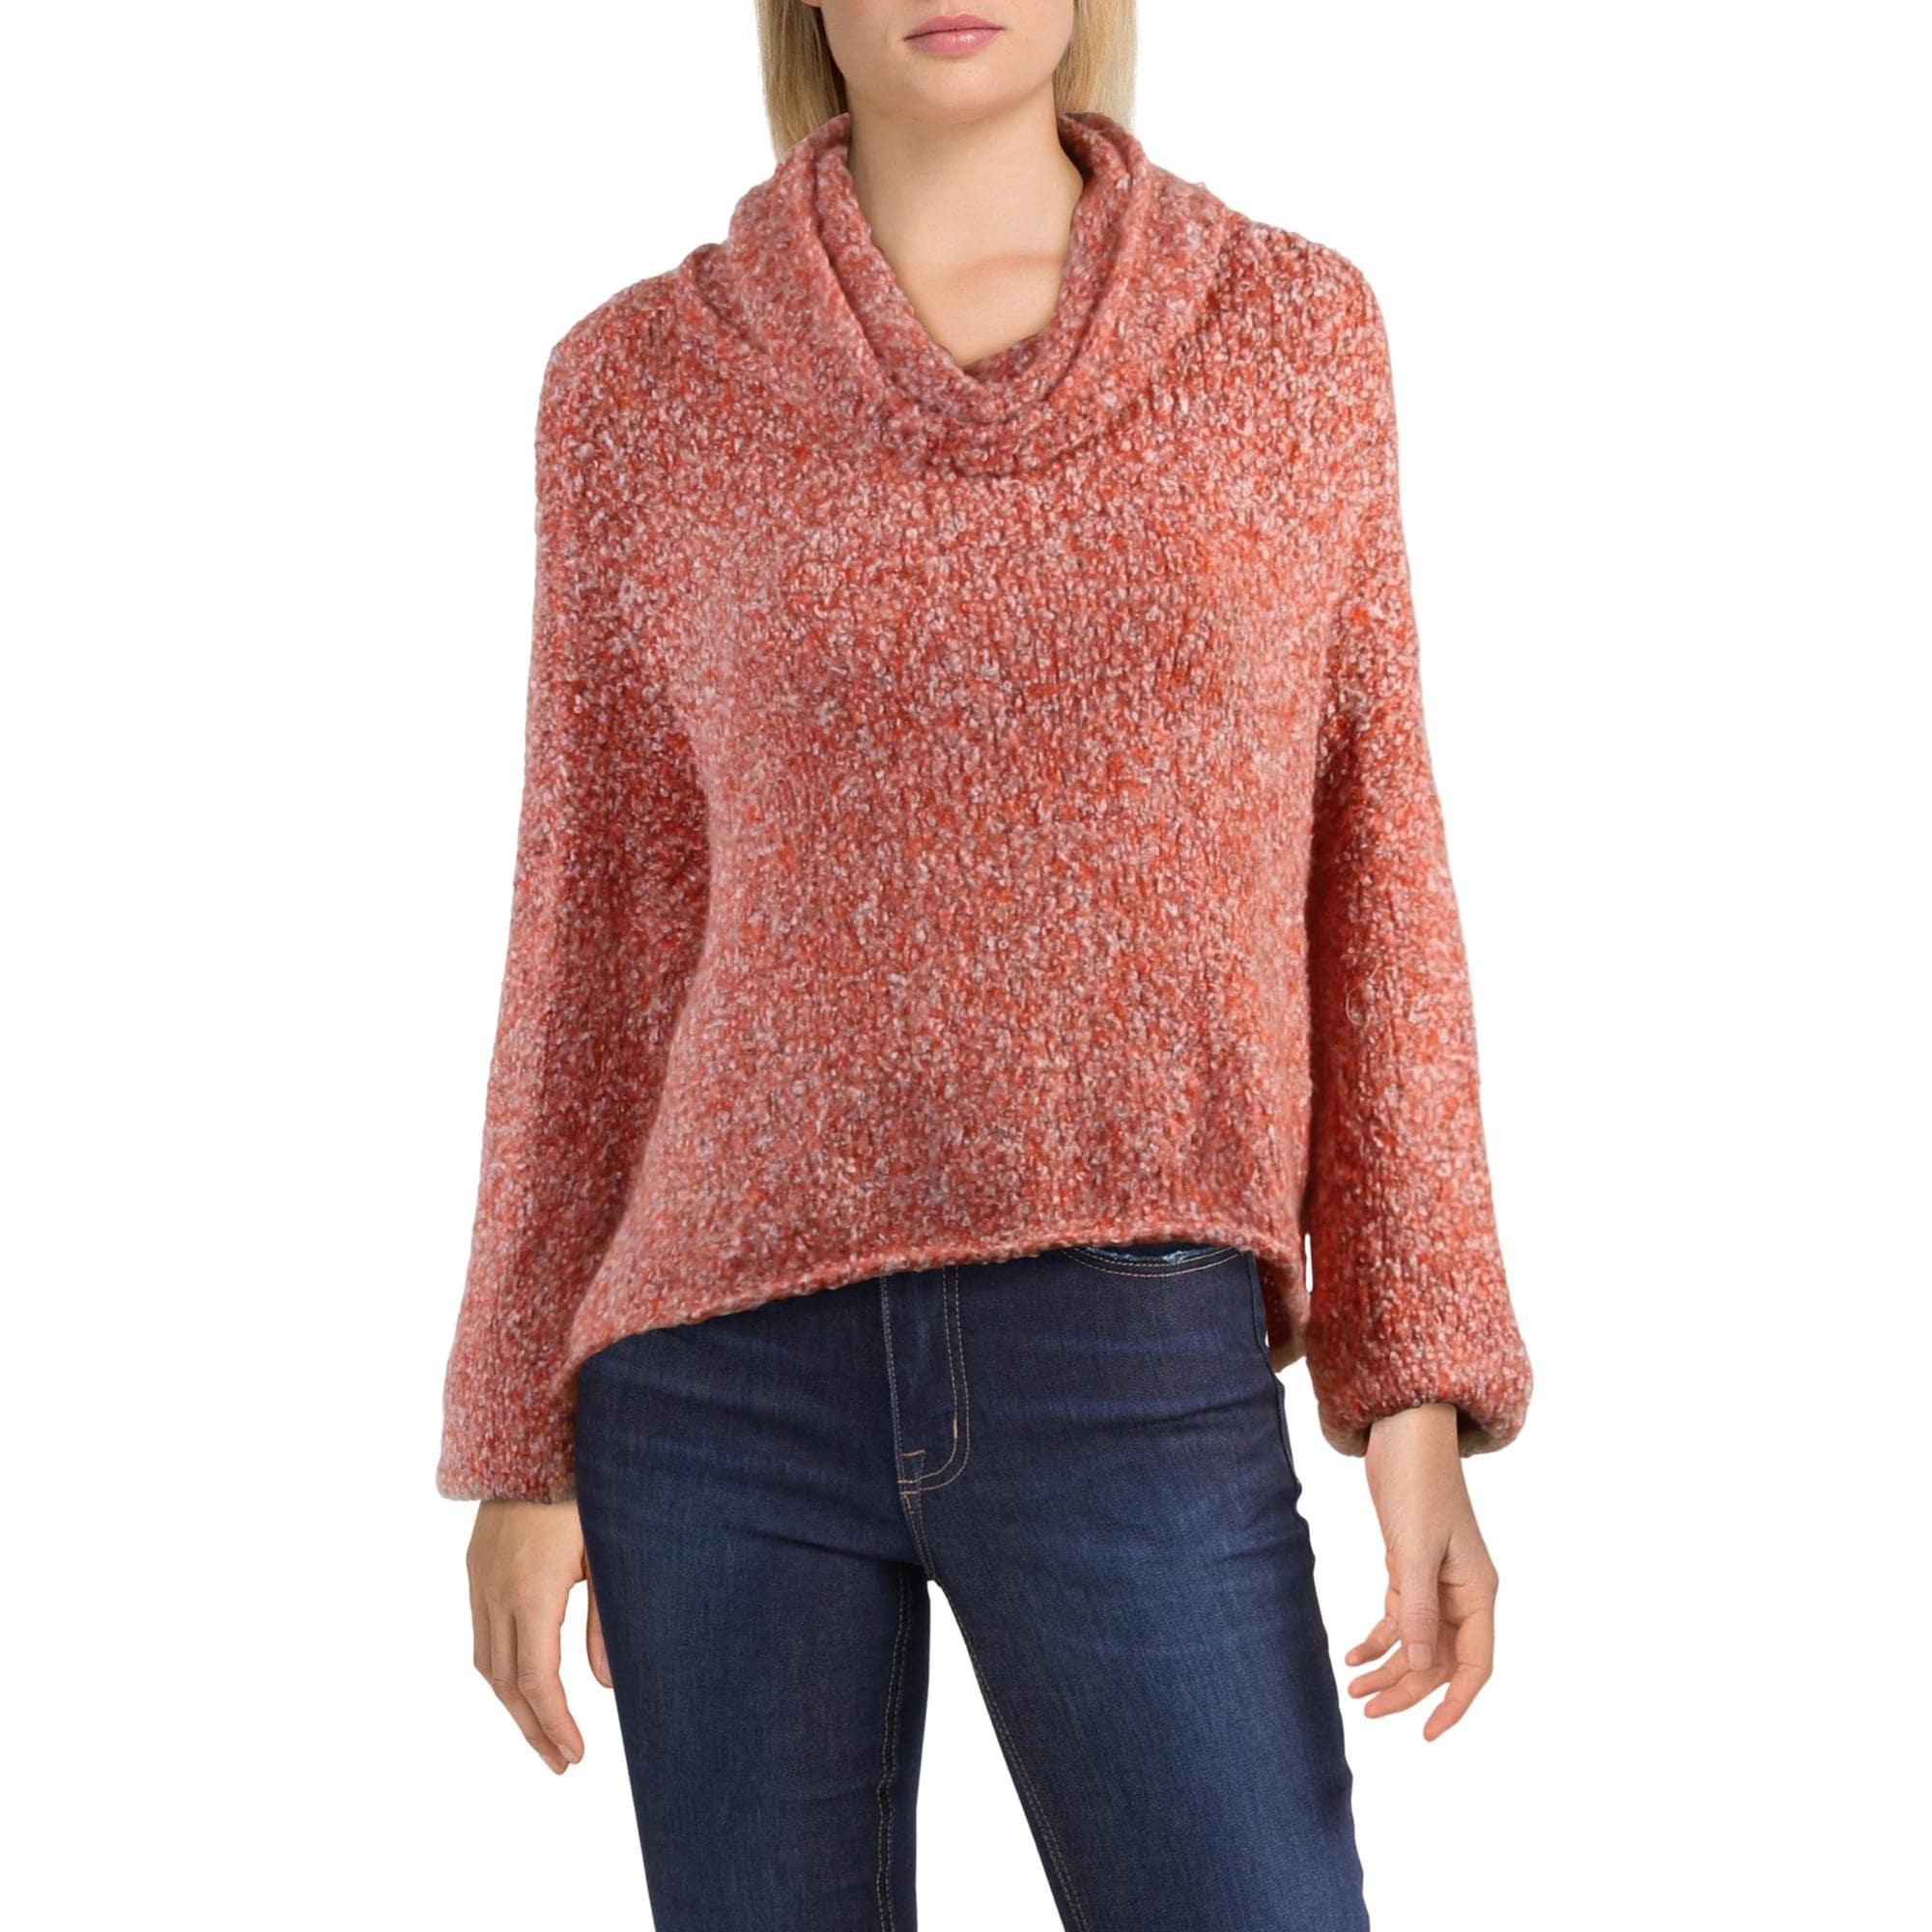 Free People Womens BFF Purple Knit Hi-Low Pullover Sweater Top XS BHFO 3532